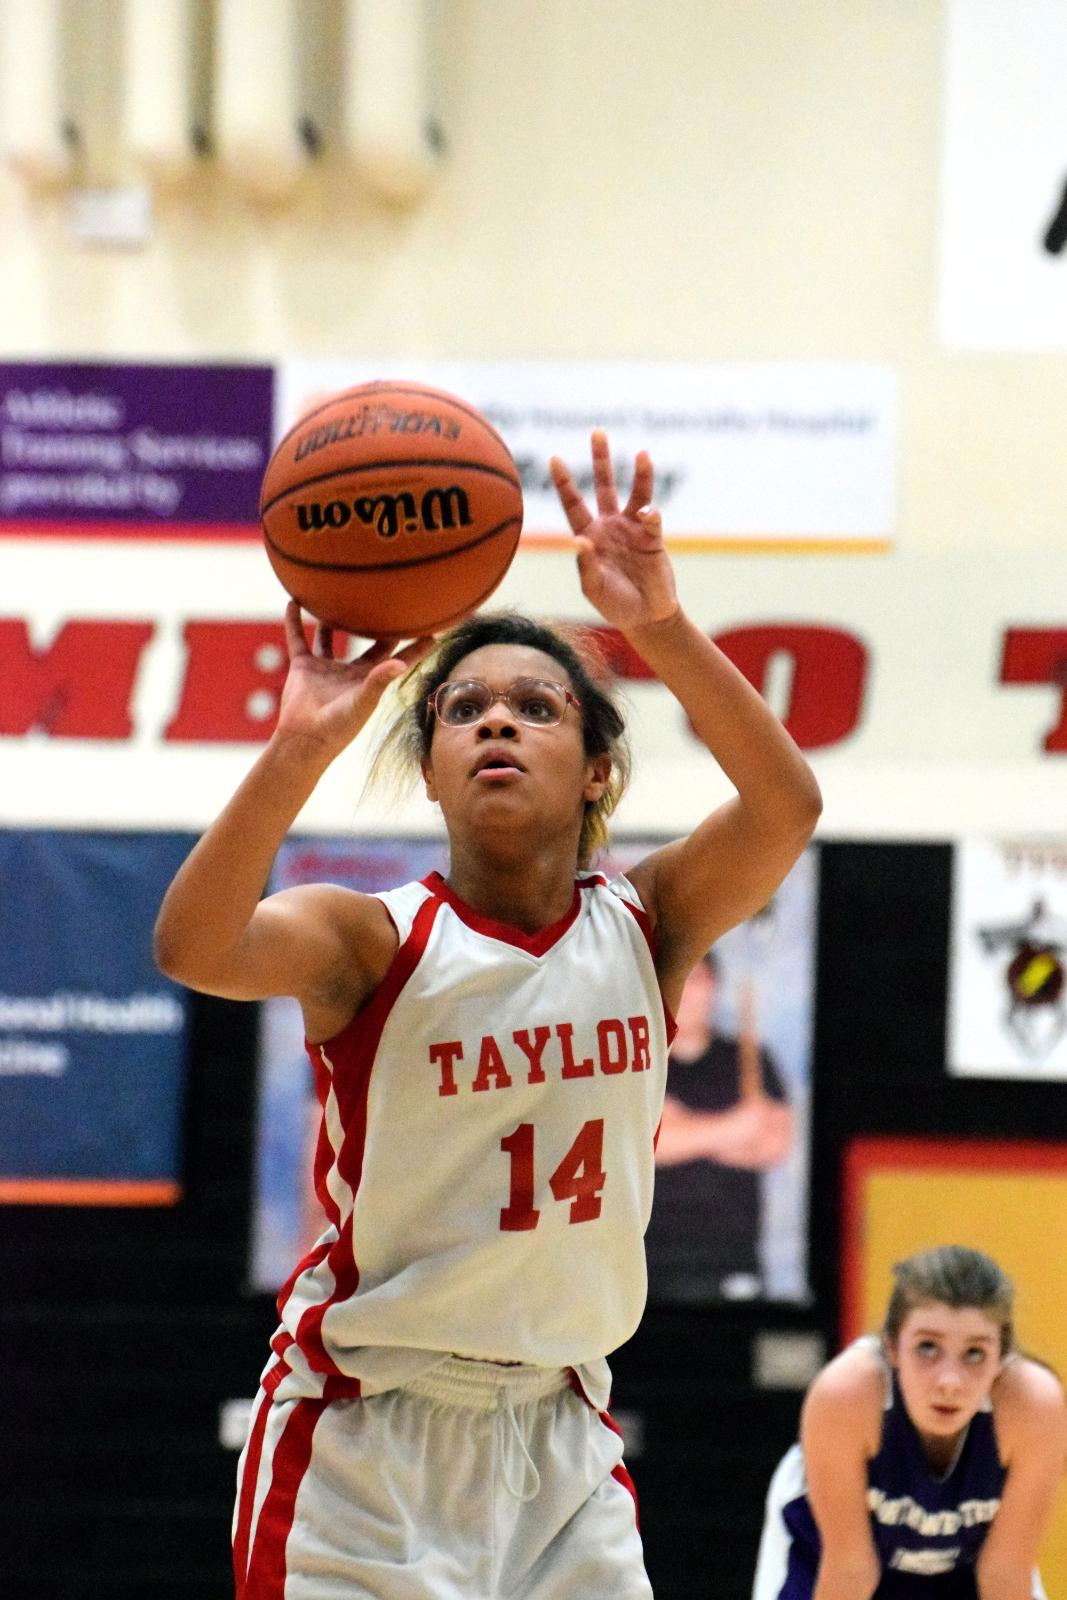 Taylor MS Girls 8th Grade Basketball vs NW 3-8-21 (Lost 30-47)